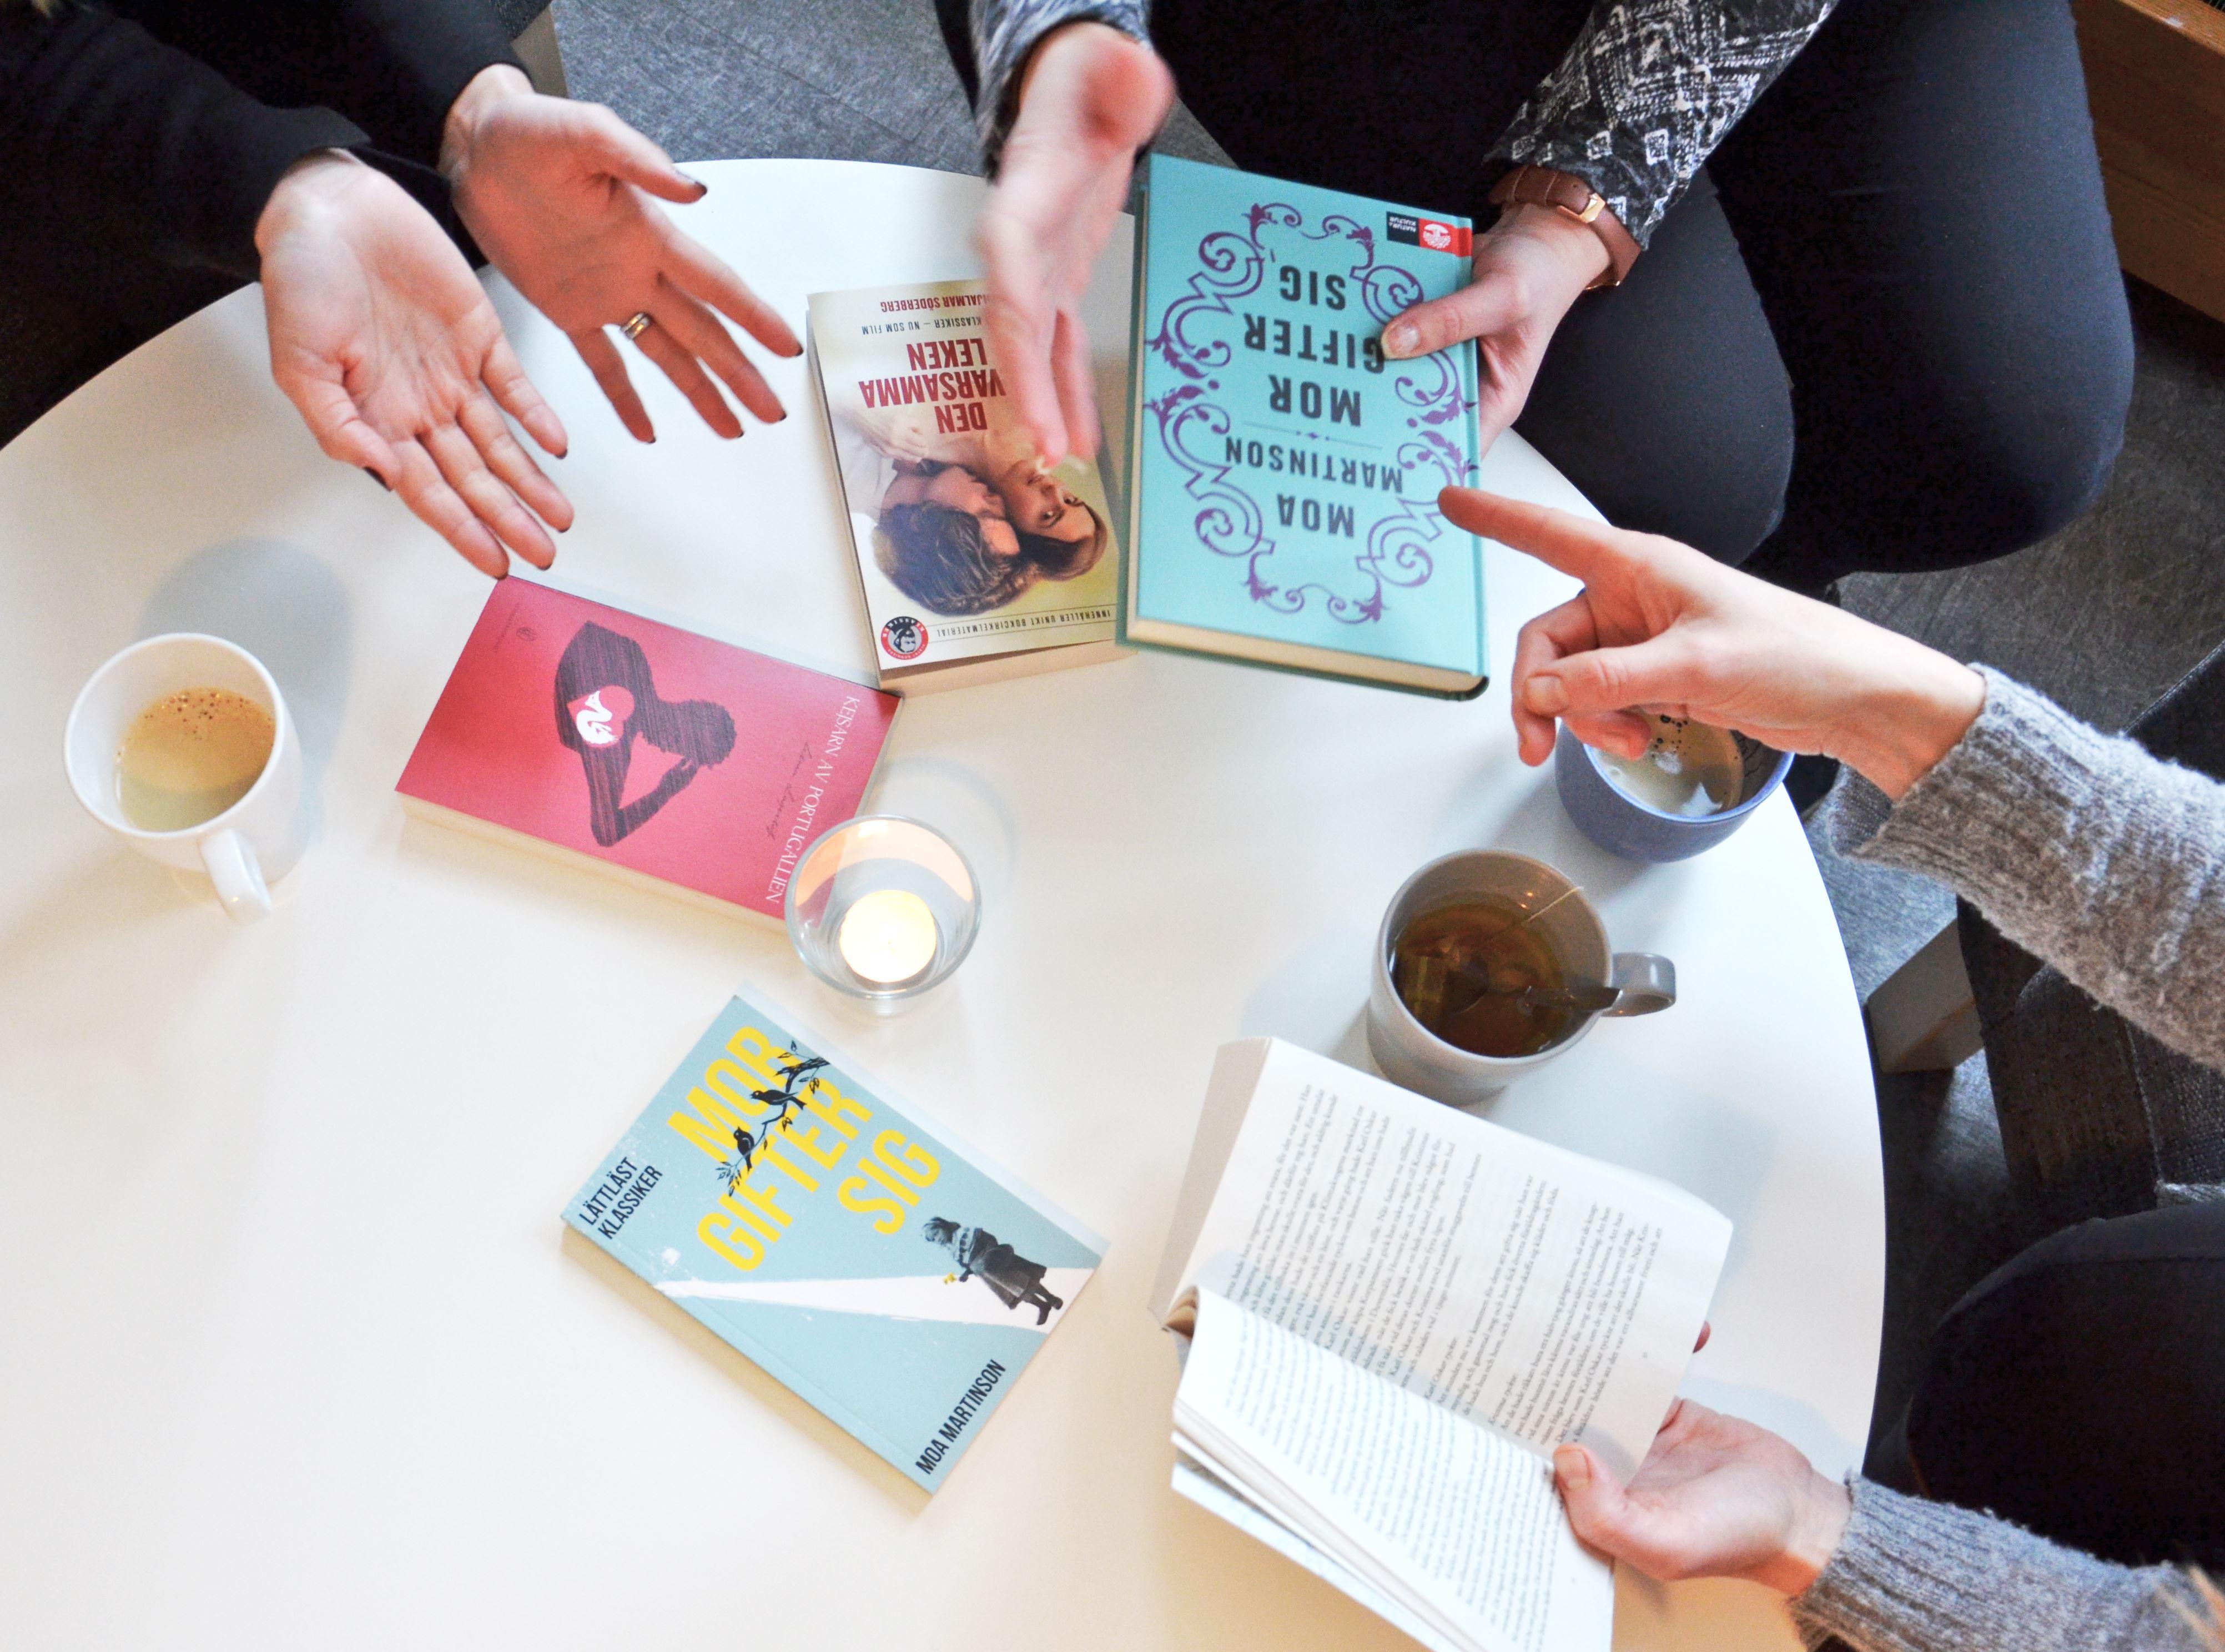 Sandvikens folkbibliotek, Öppet boksamtal: